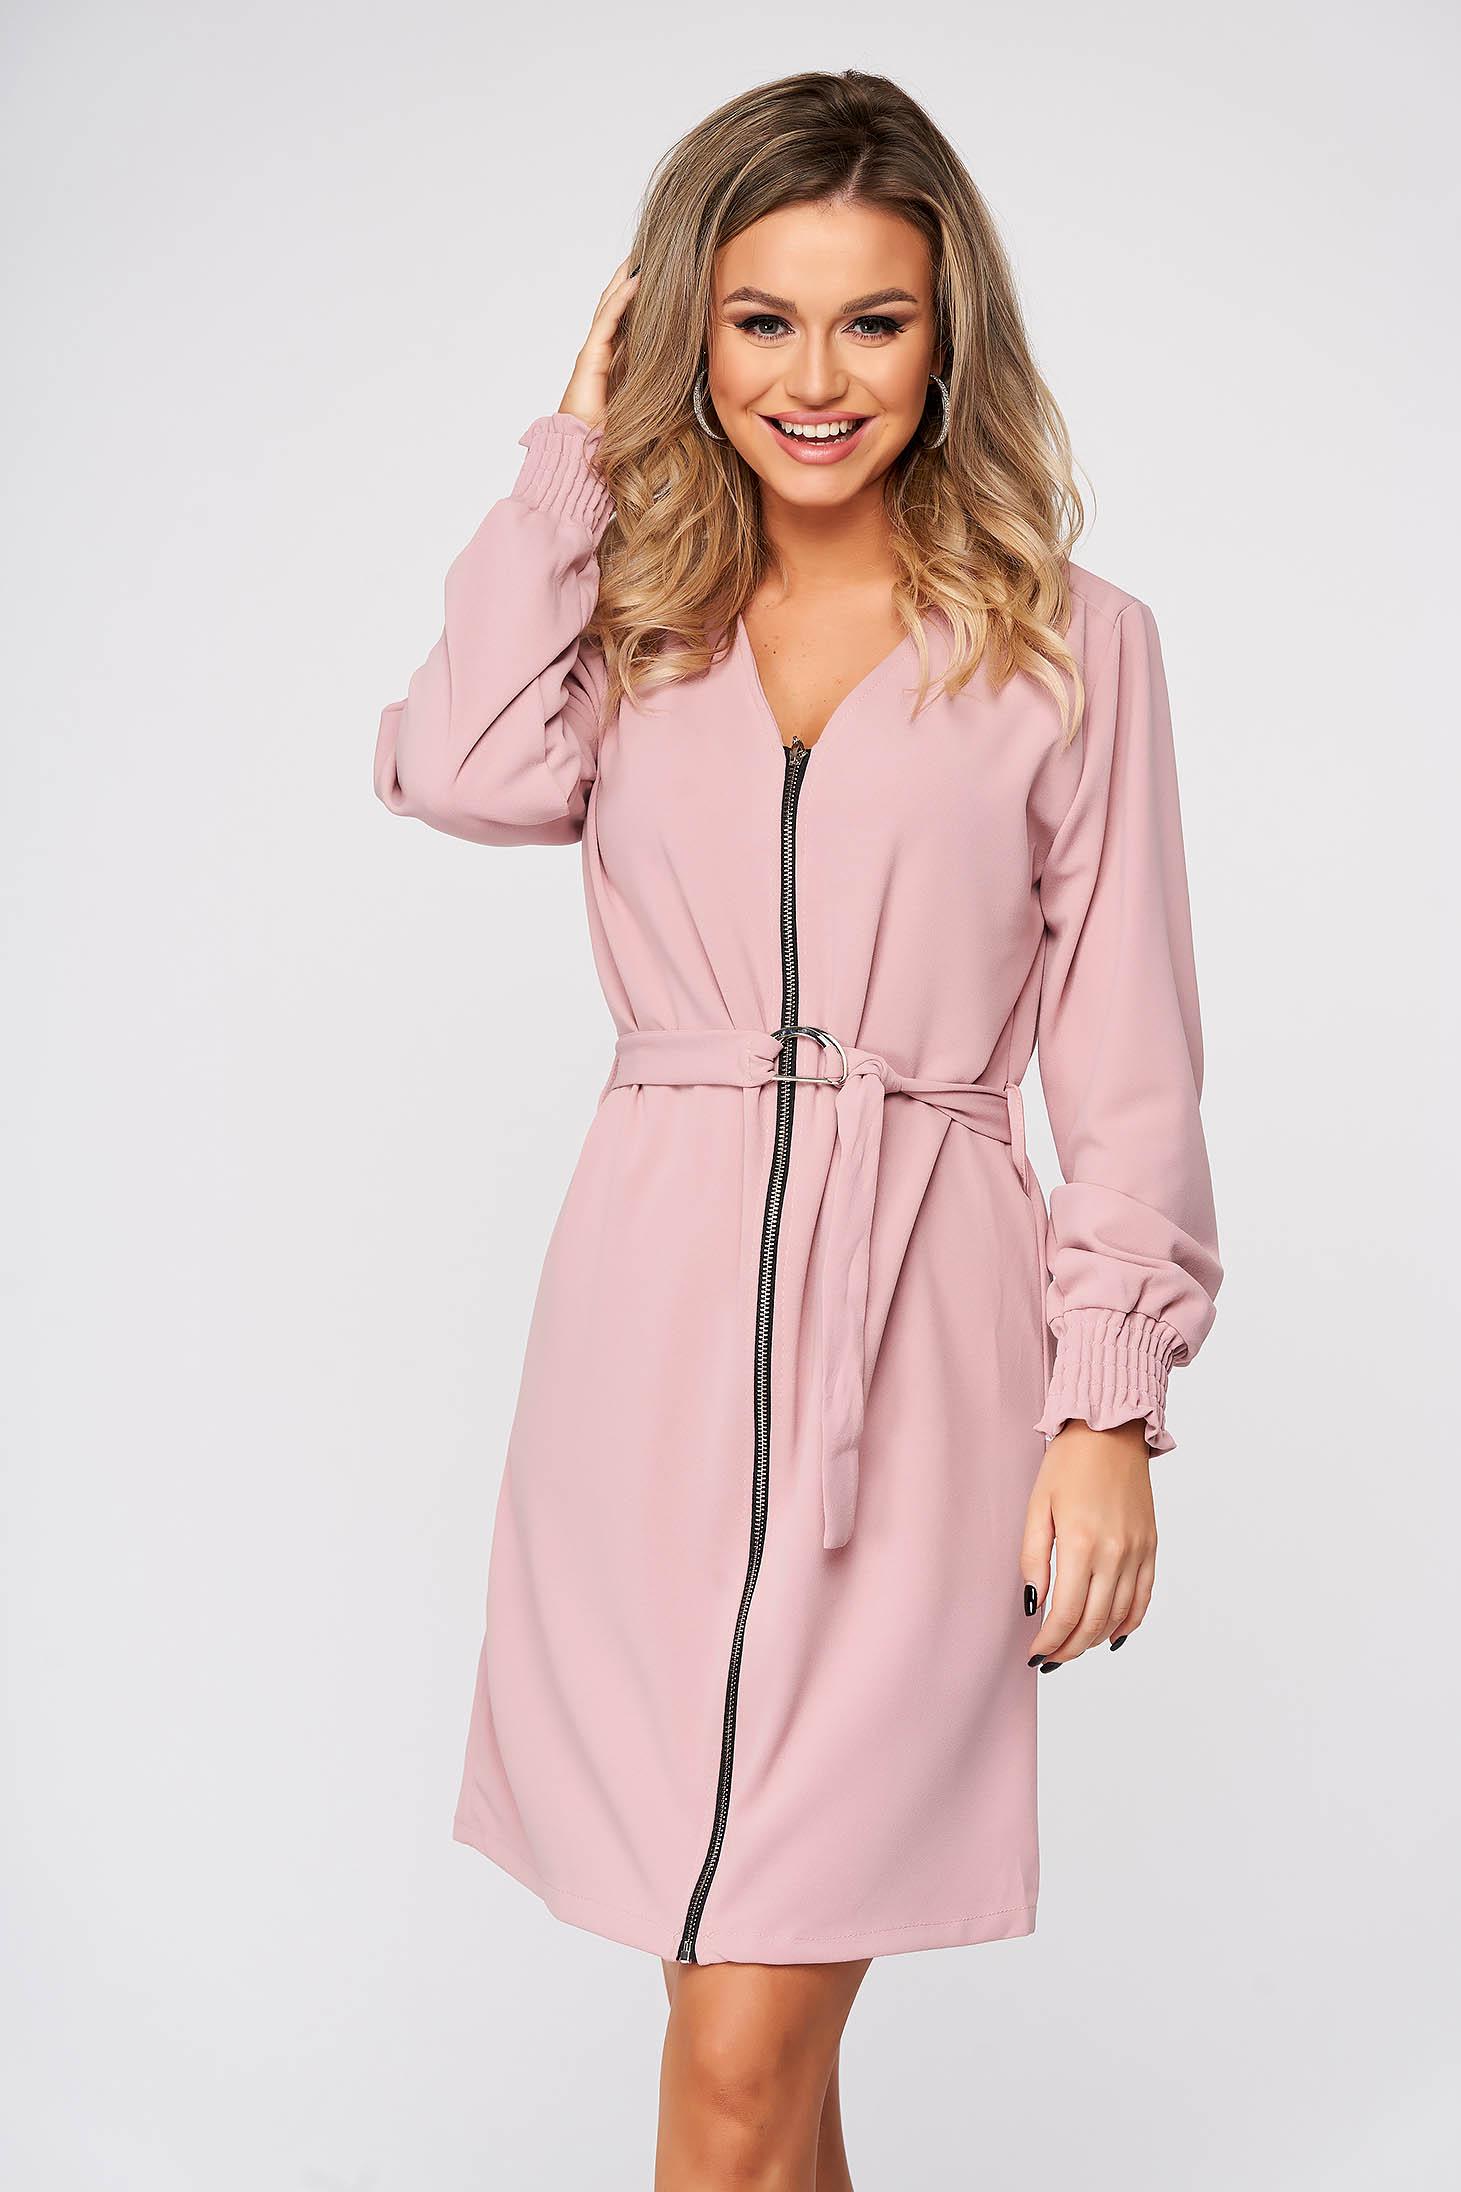 Rochie SunShine roz prafuit de zi cu un croi drept cu decolteu in v accesorizata cu cordon